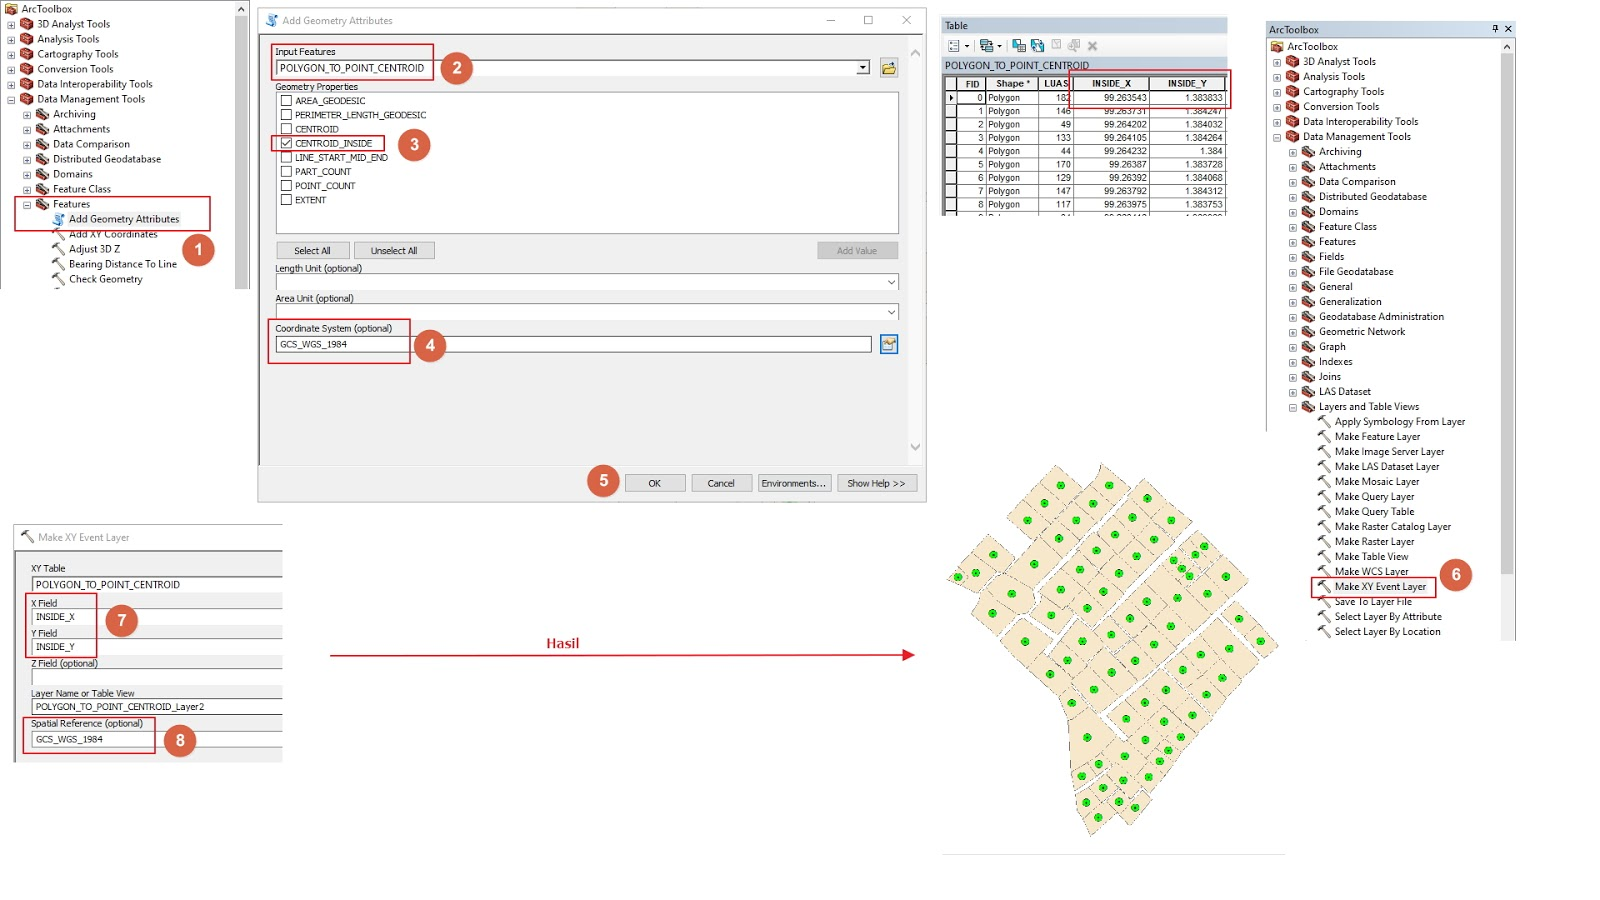 Konversi Fitur Polygon ke Point (Titik Tengah) pada ArcGIS